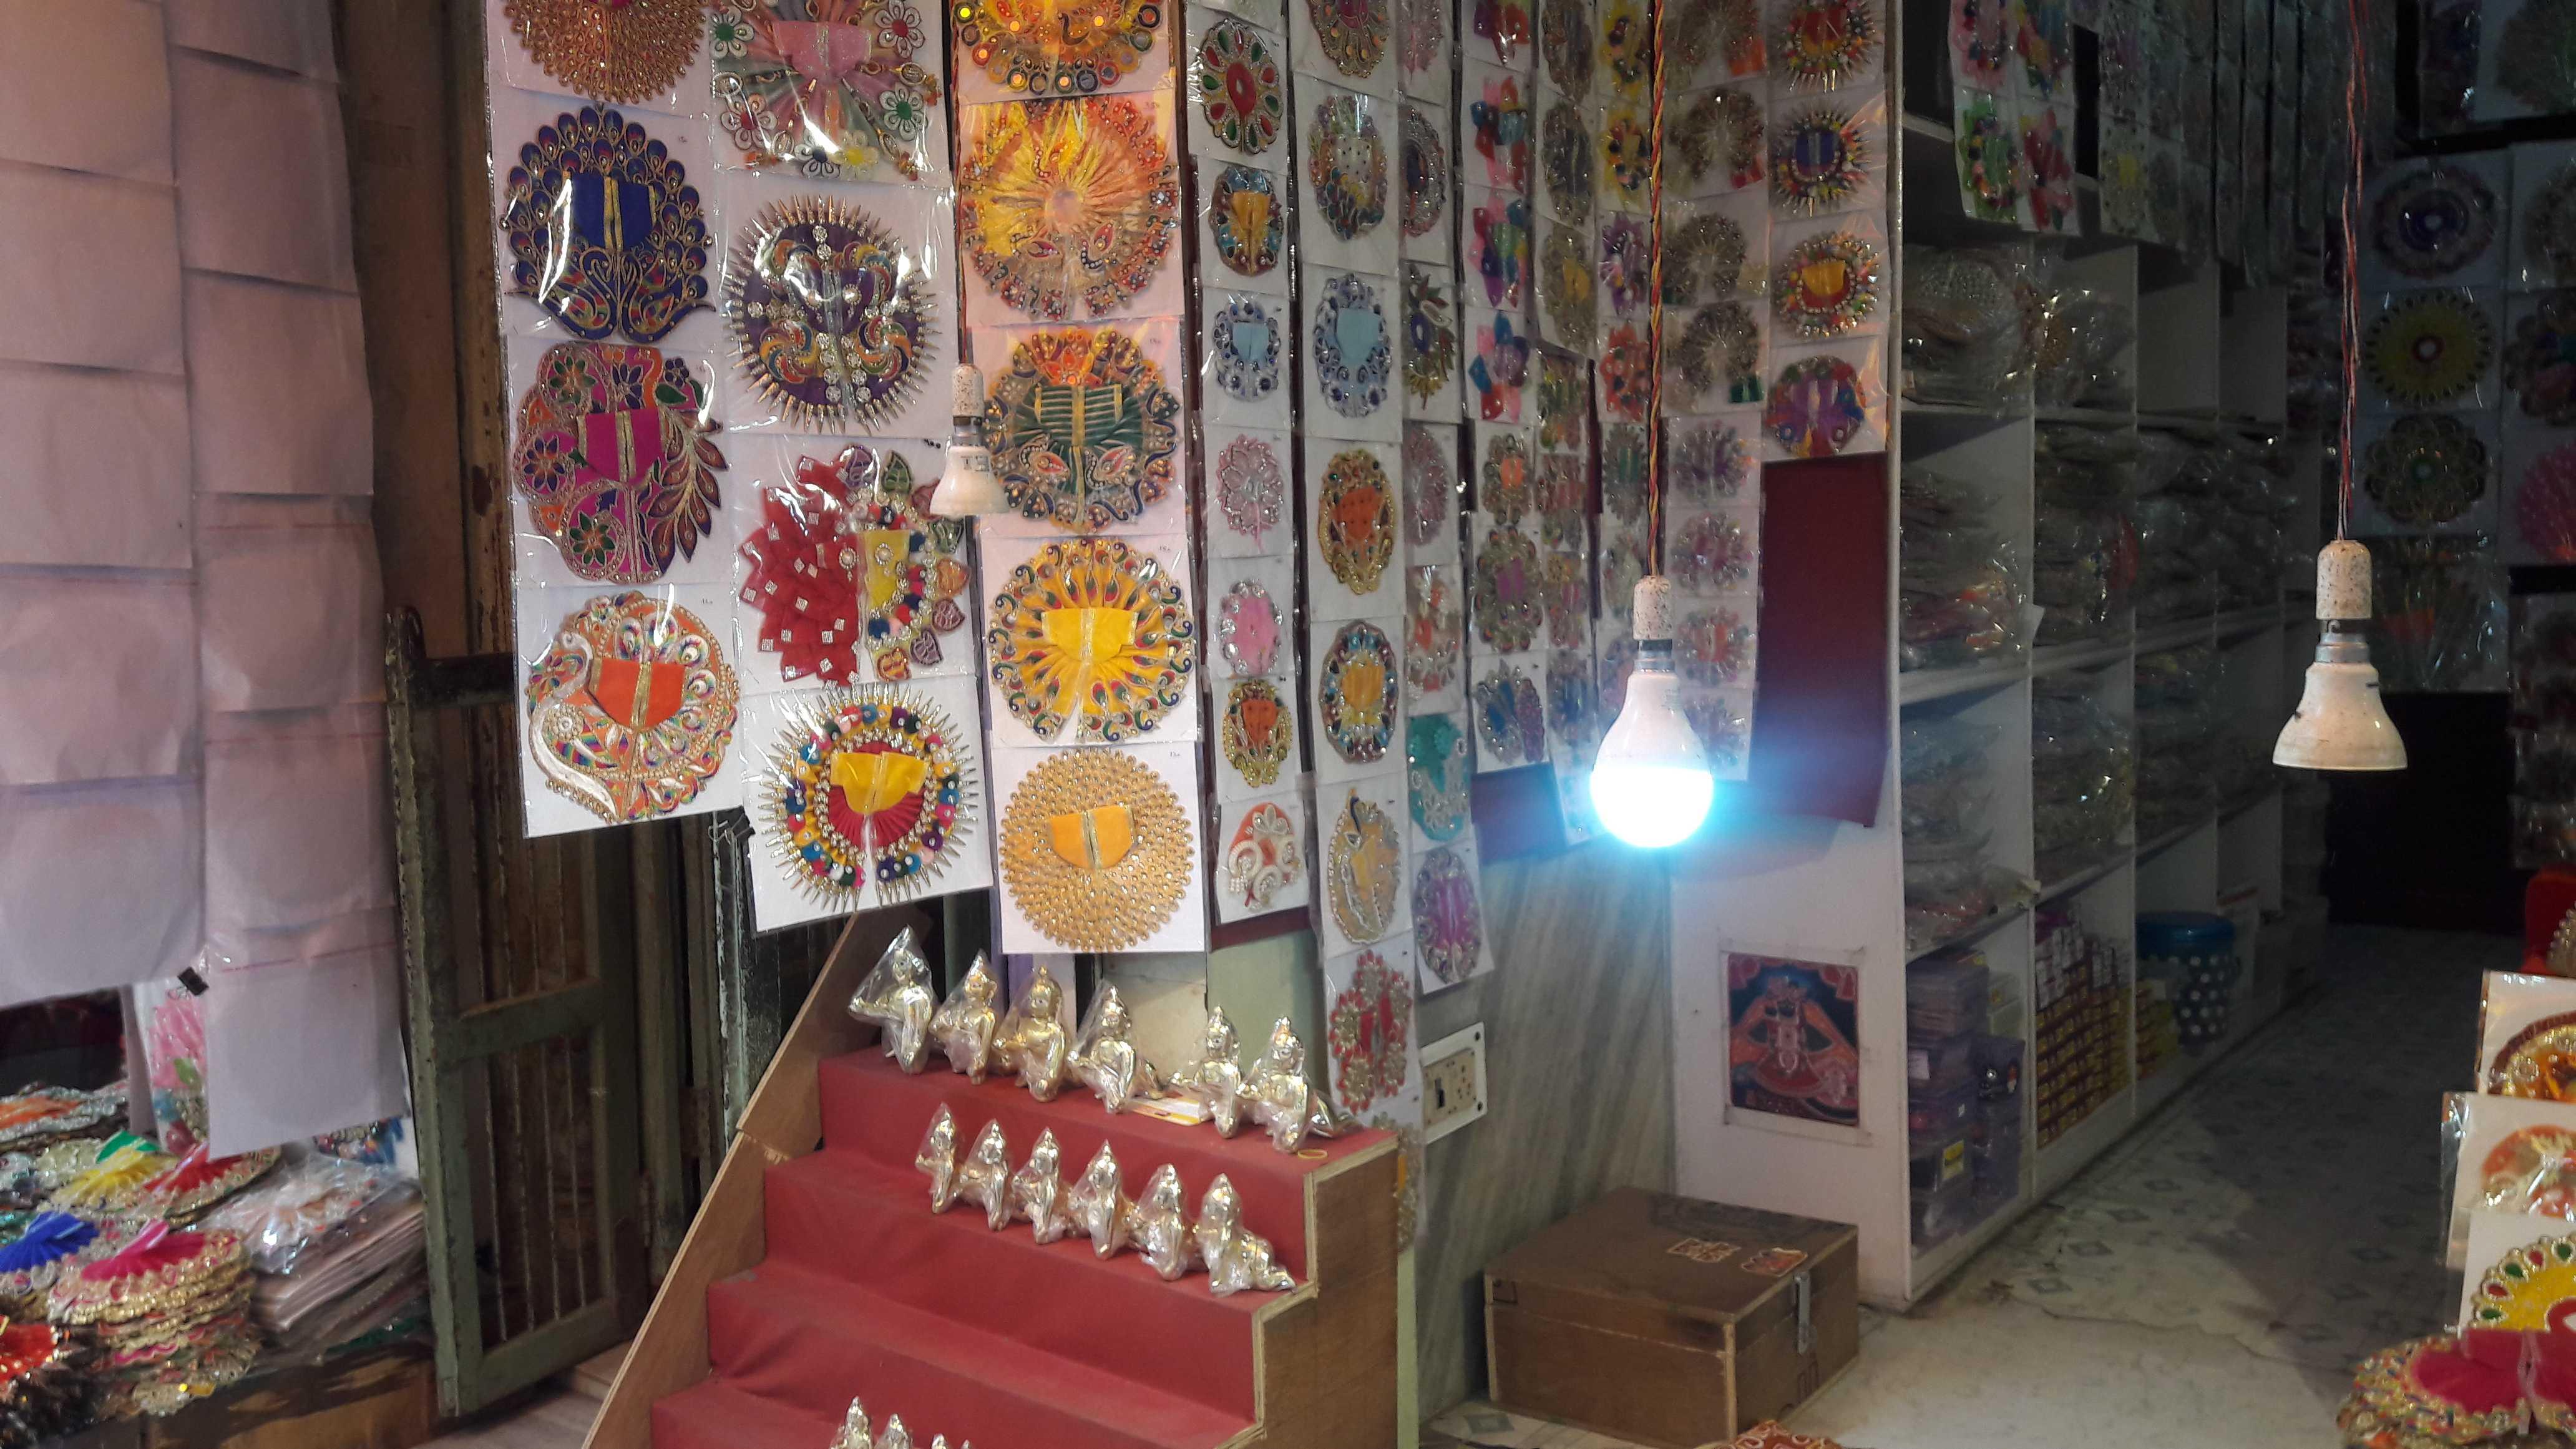 All colorful shops selling fine merchandise in vrindavan-fnbworld